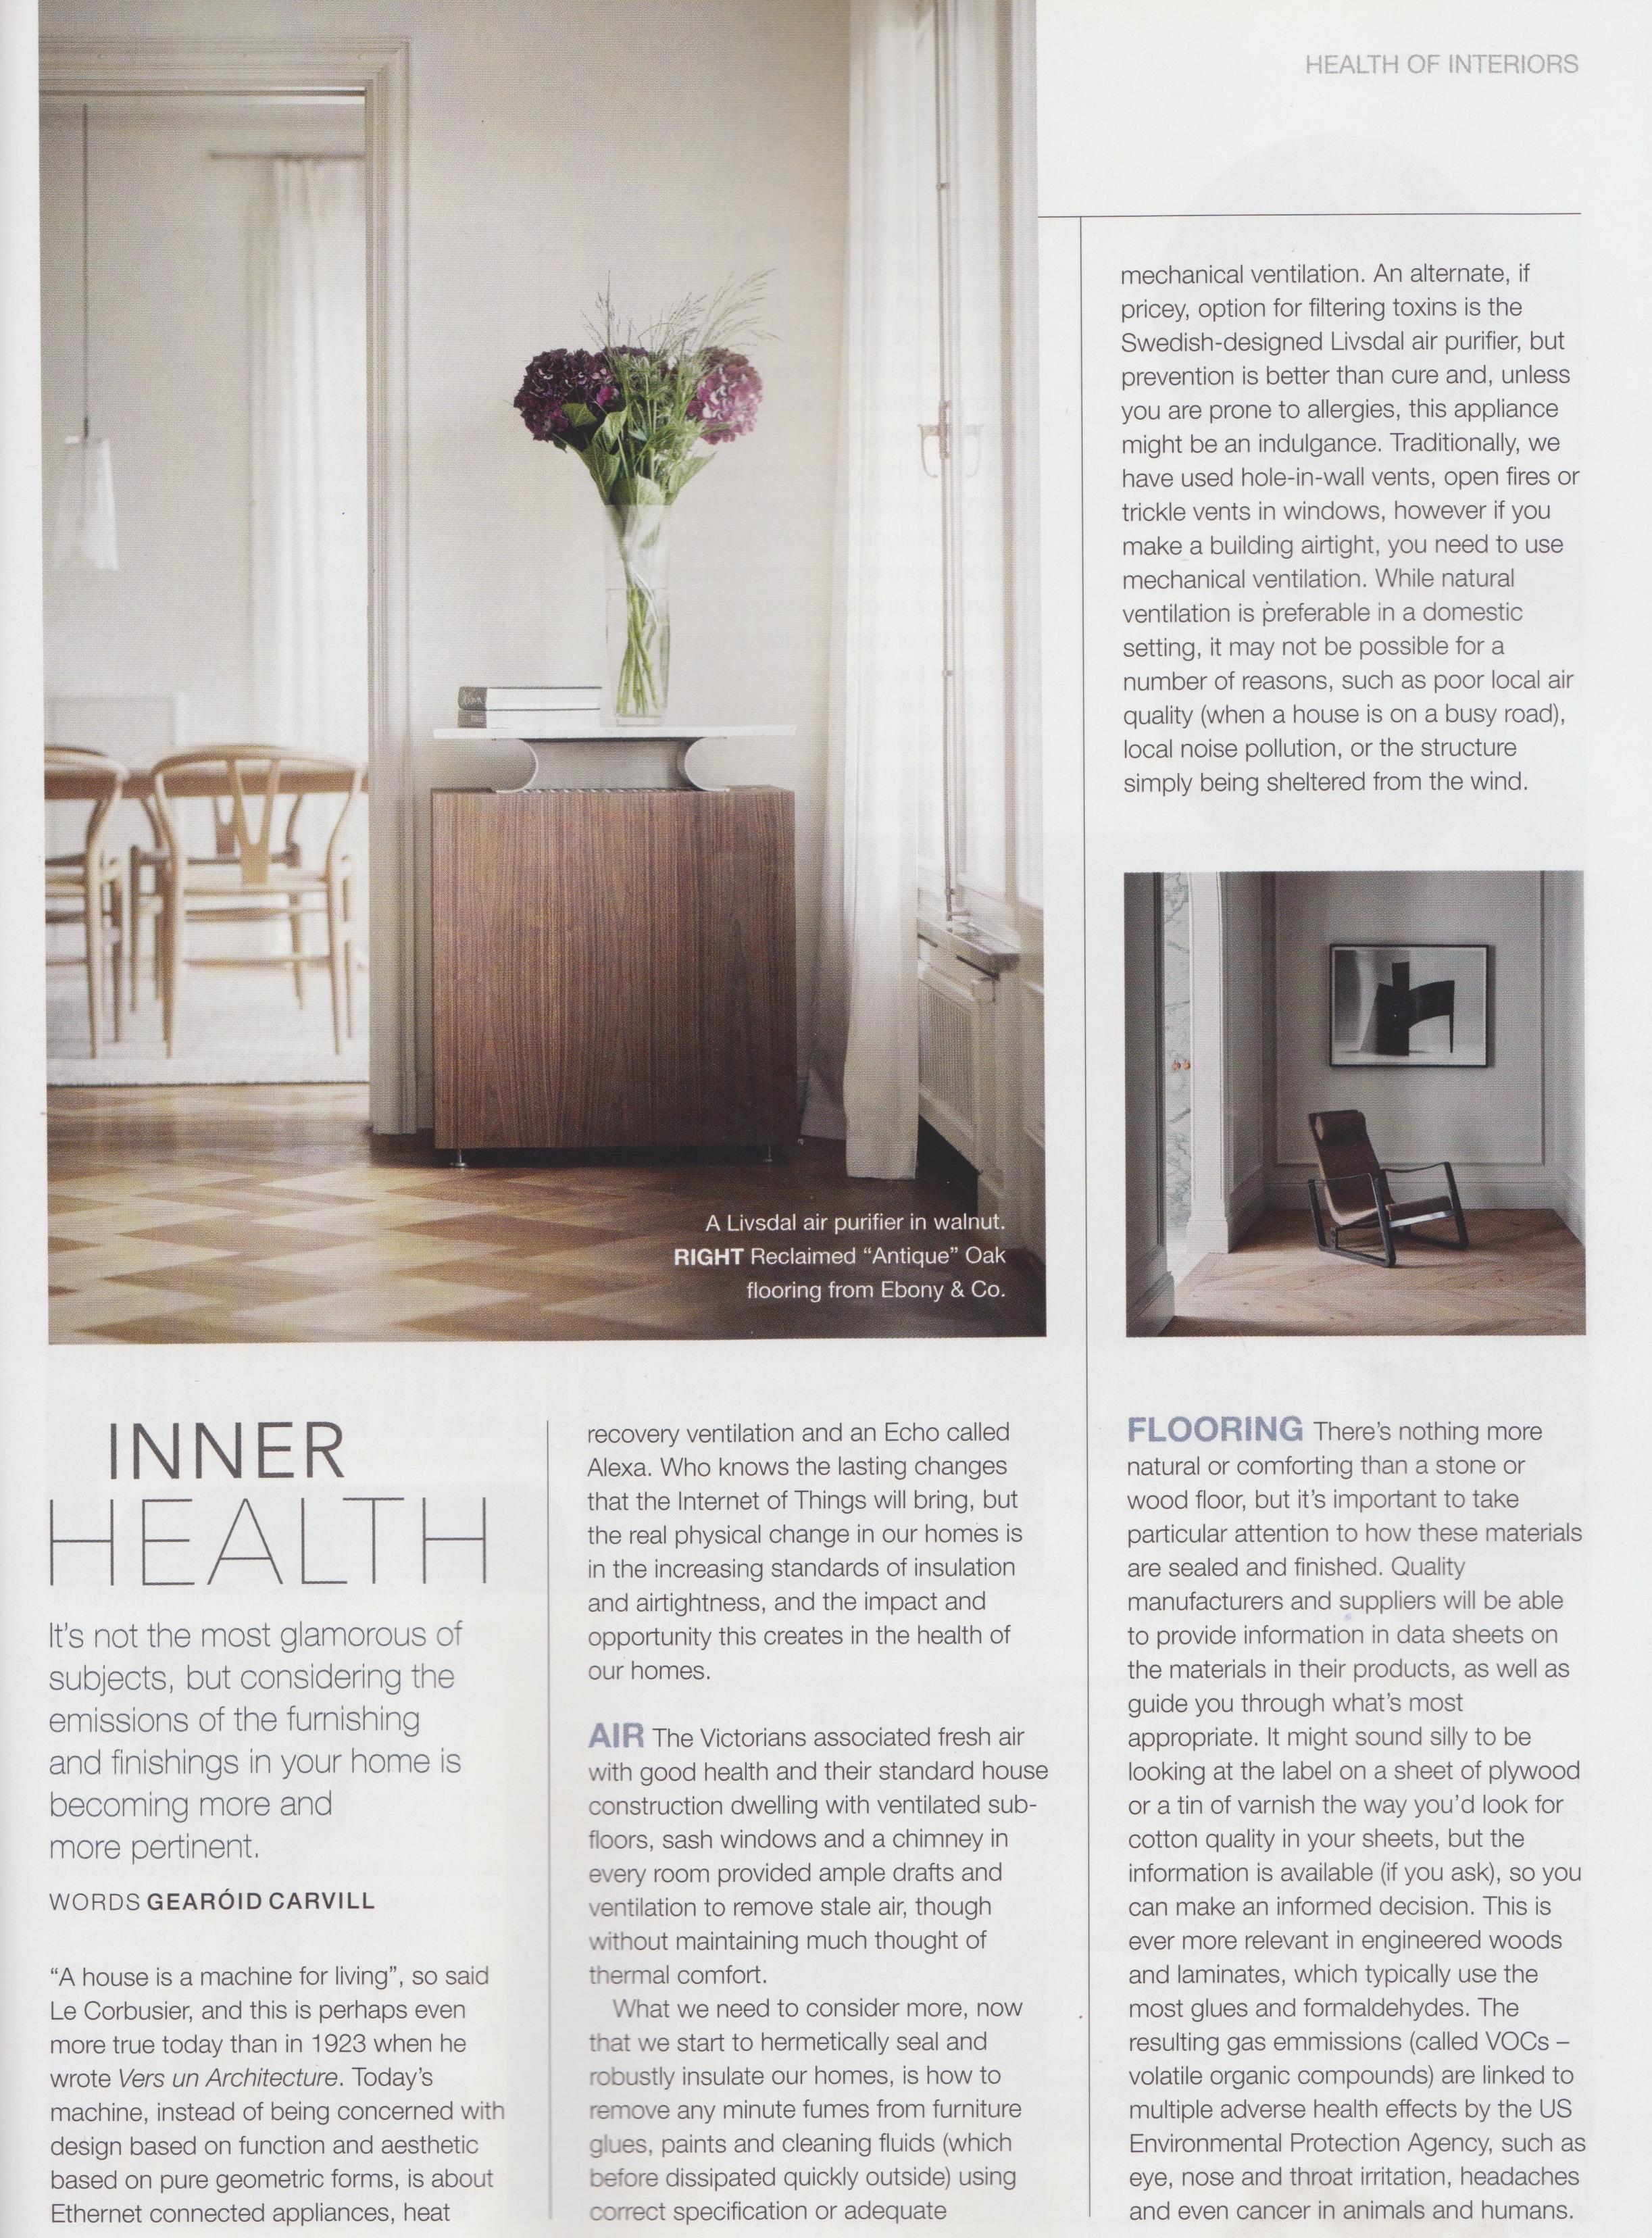 Inner Health P1 - Image Interiors.jpeg